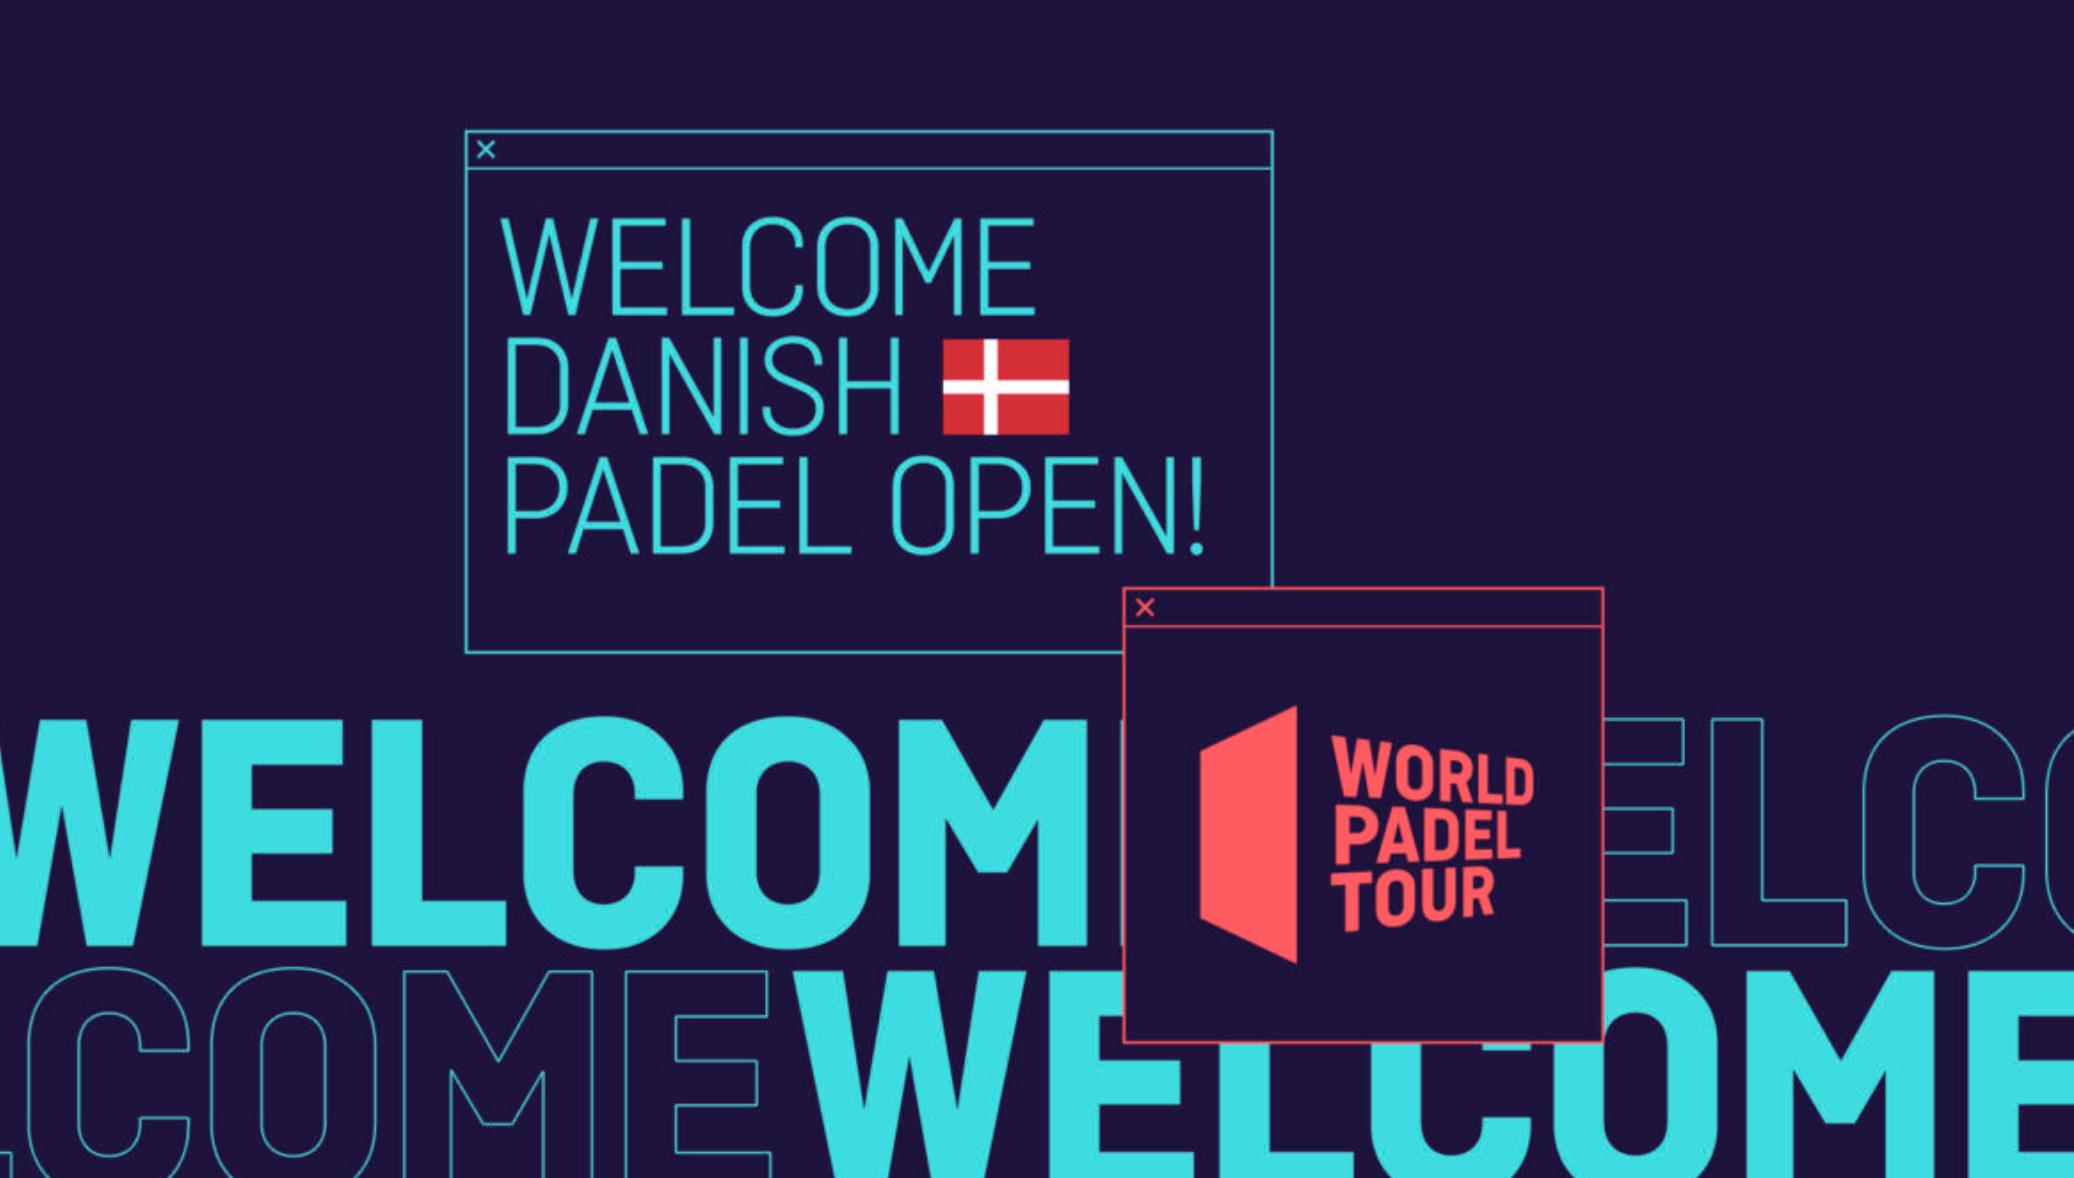 WPT: Danmark får sit dansk Padel Åben i 2 år!